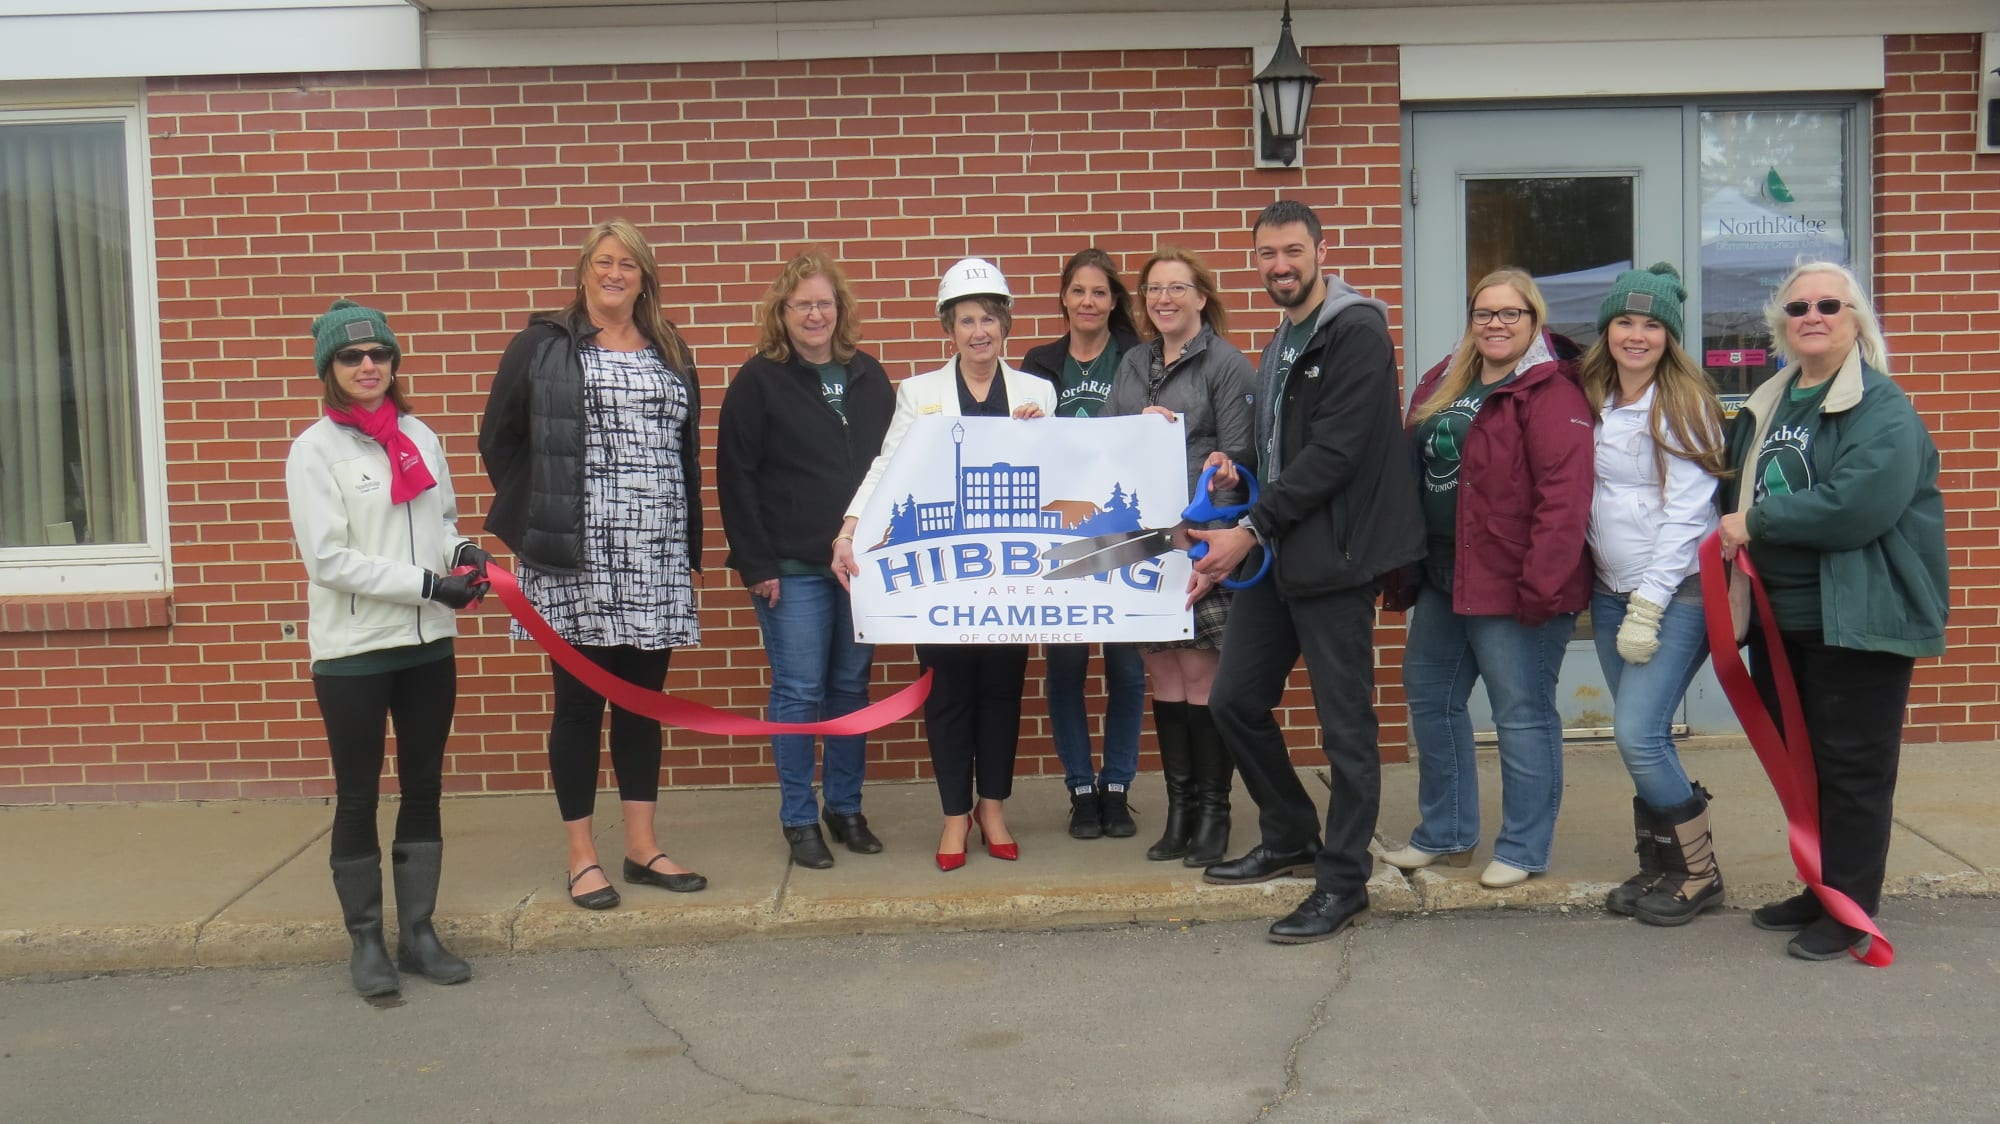 NorthRidge Community Credit Union - Expanded to Hibbing